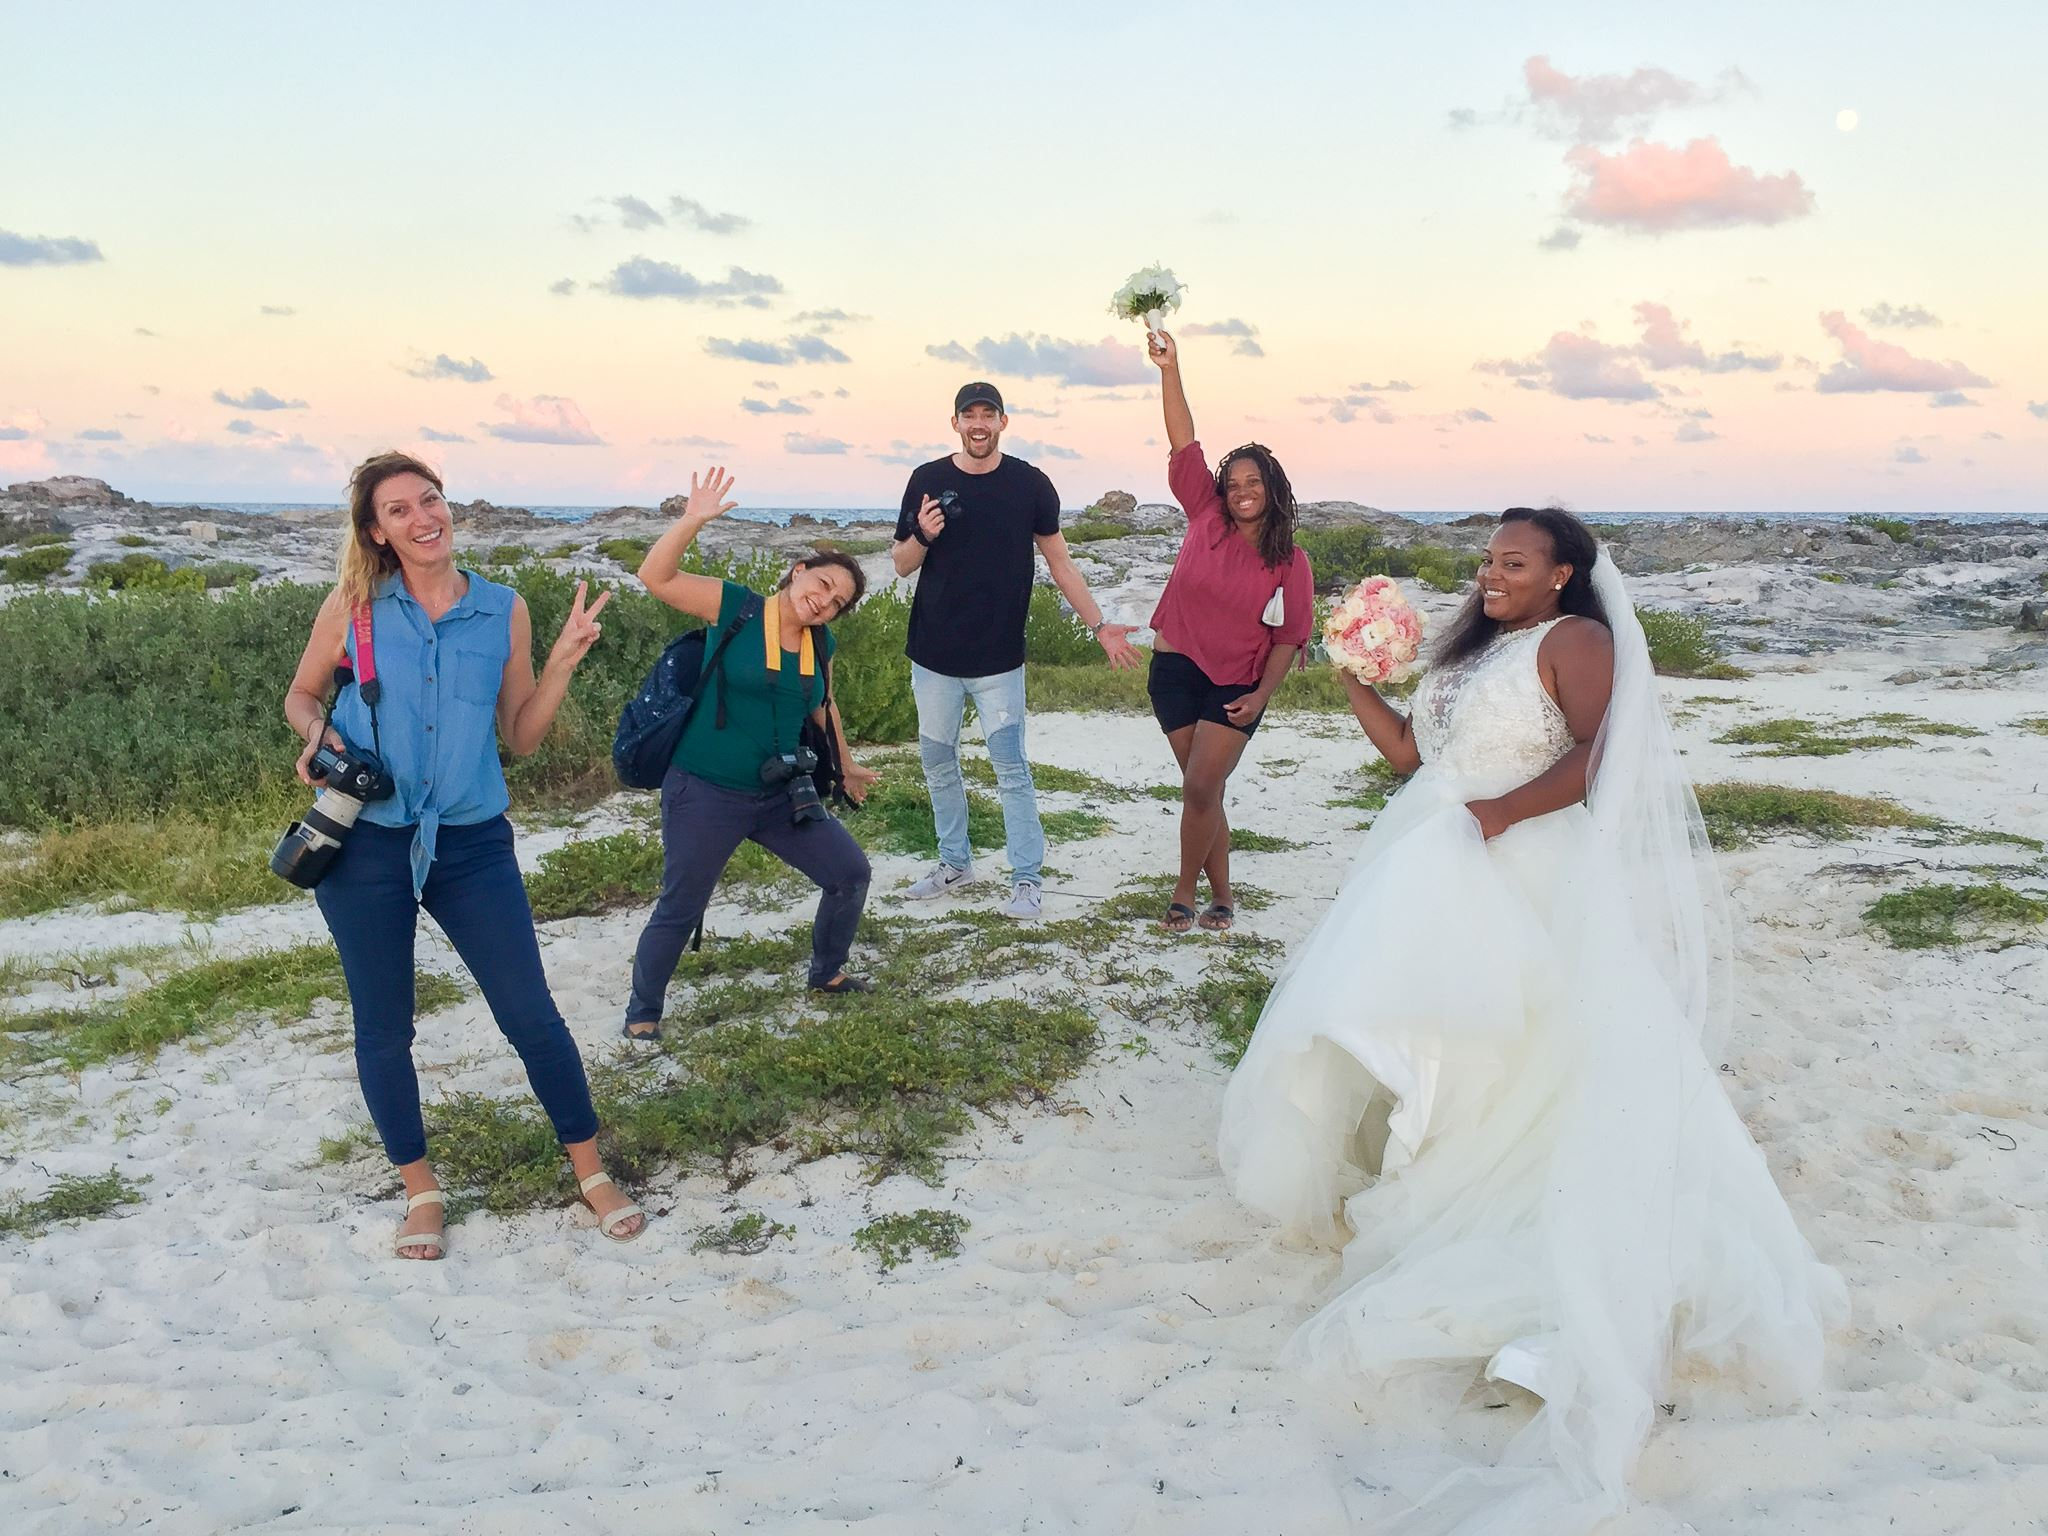 cancun wedding photos; a day after session photos; Hyatt Ziva Cancun wedding photographer; fotografo matrimoni; photosmile cancun team